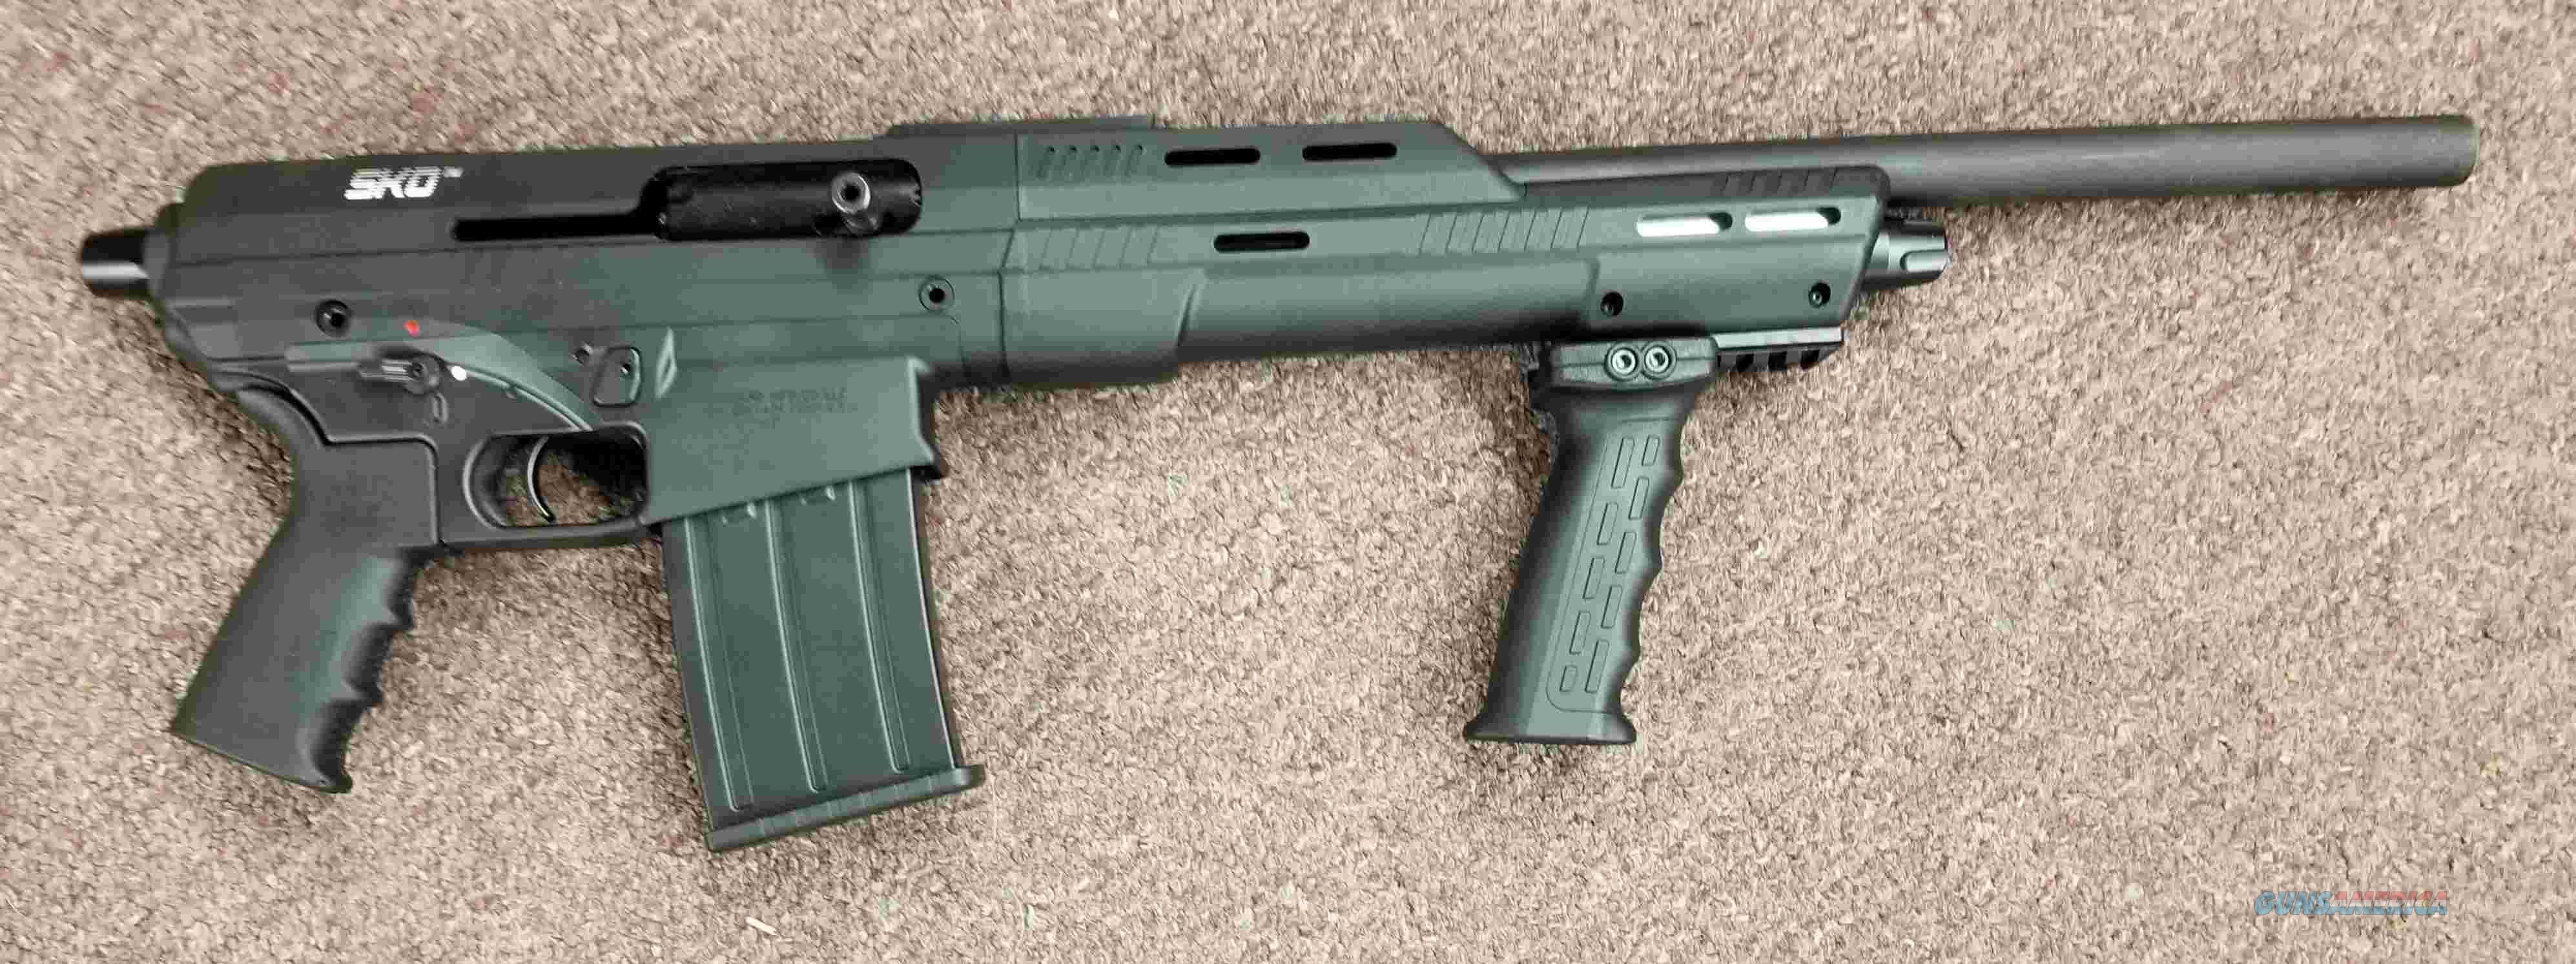 14ac6c37cf6e Standard Manufacturing SKO - 12 Gauge Semi Auto - Free Shipping !! Guns    Shotguns